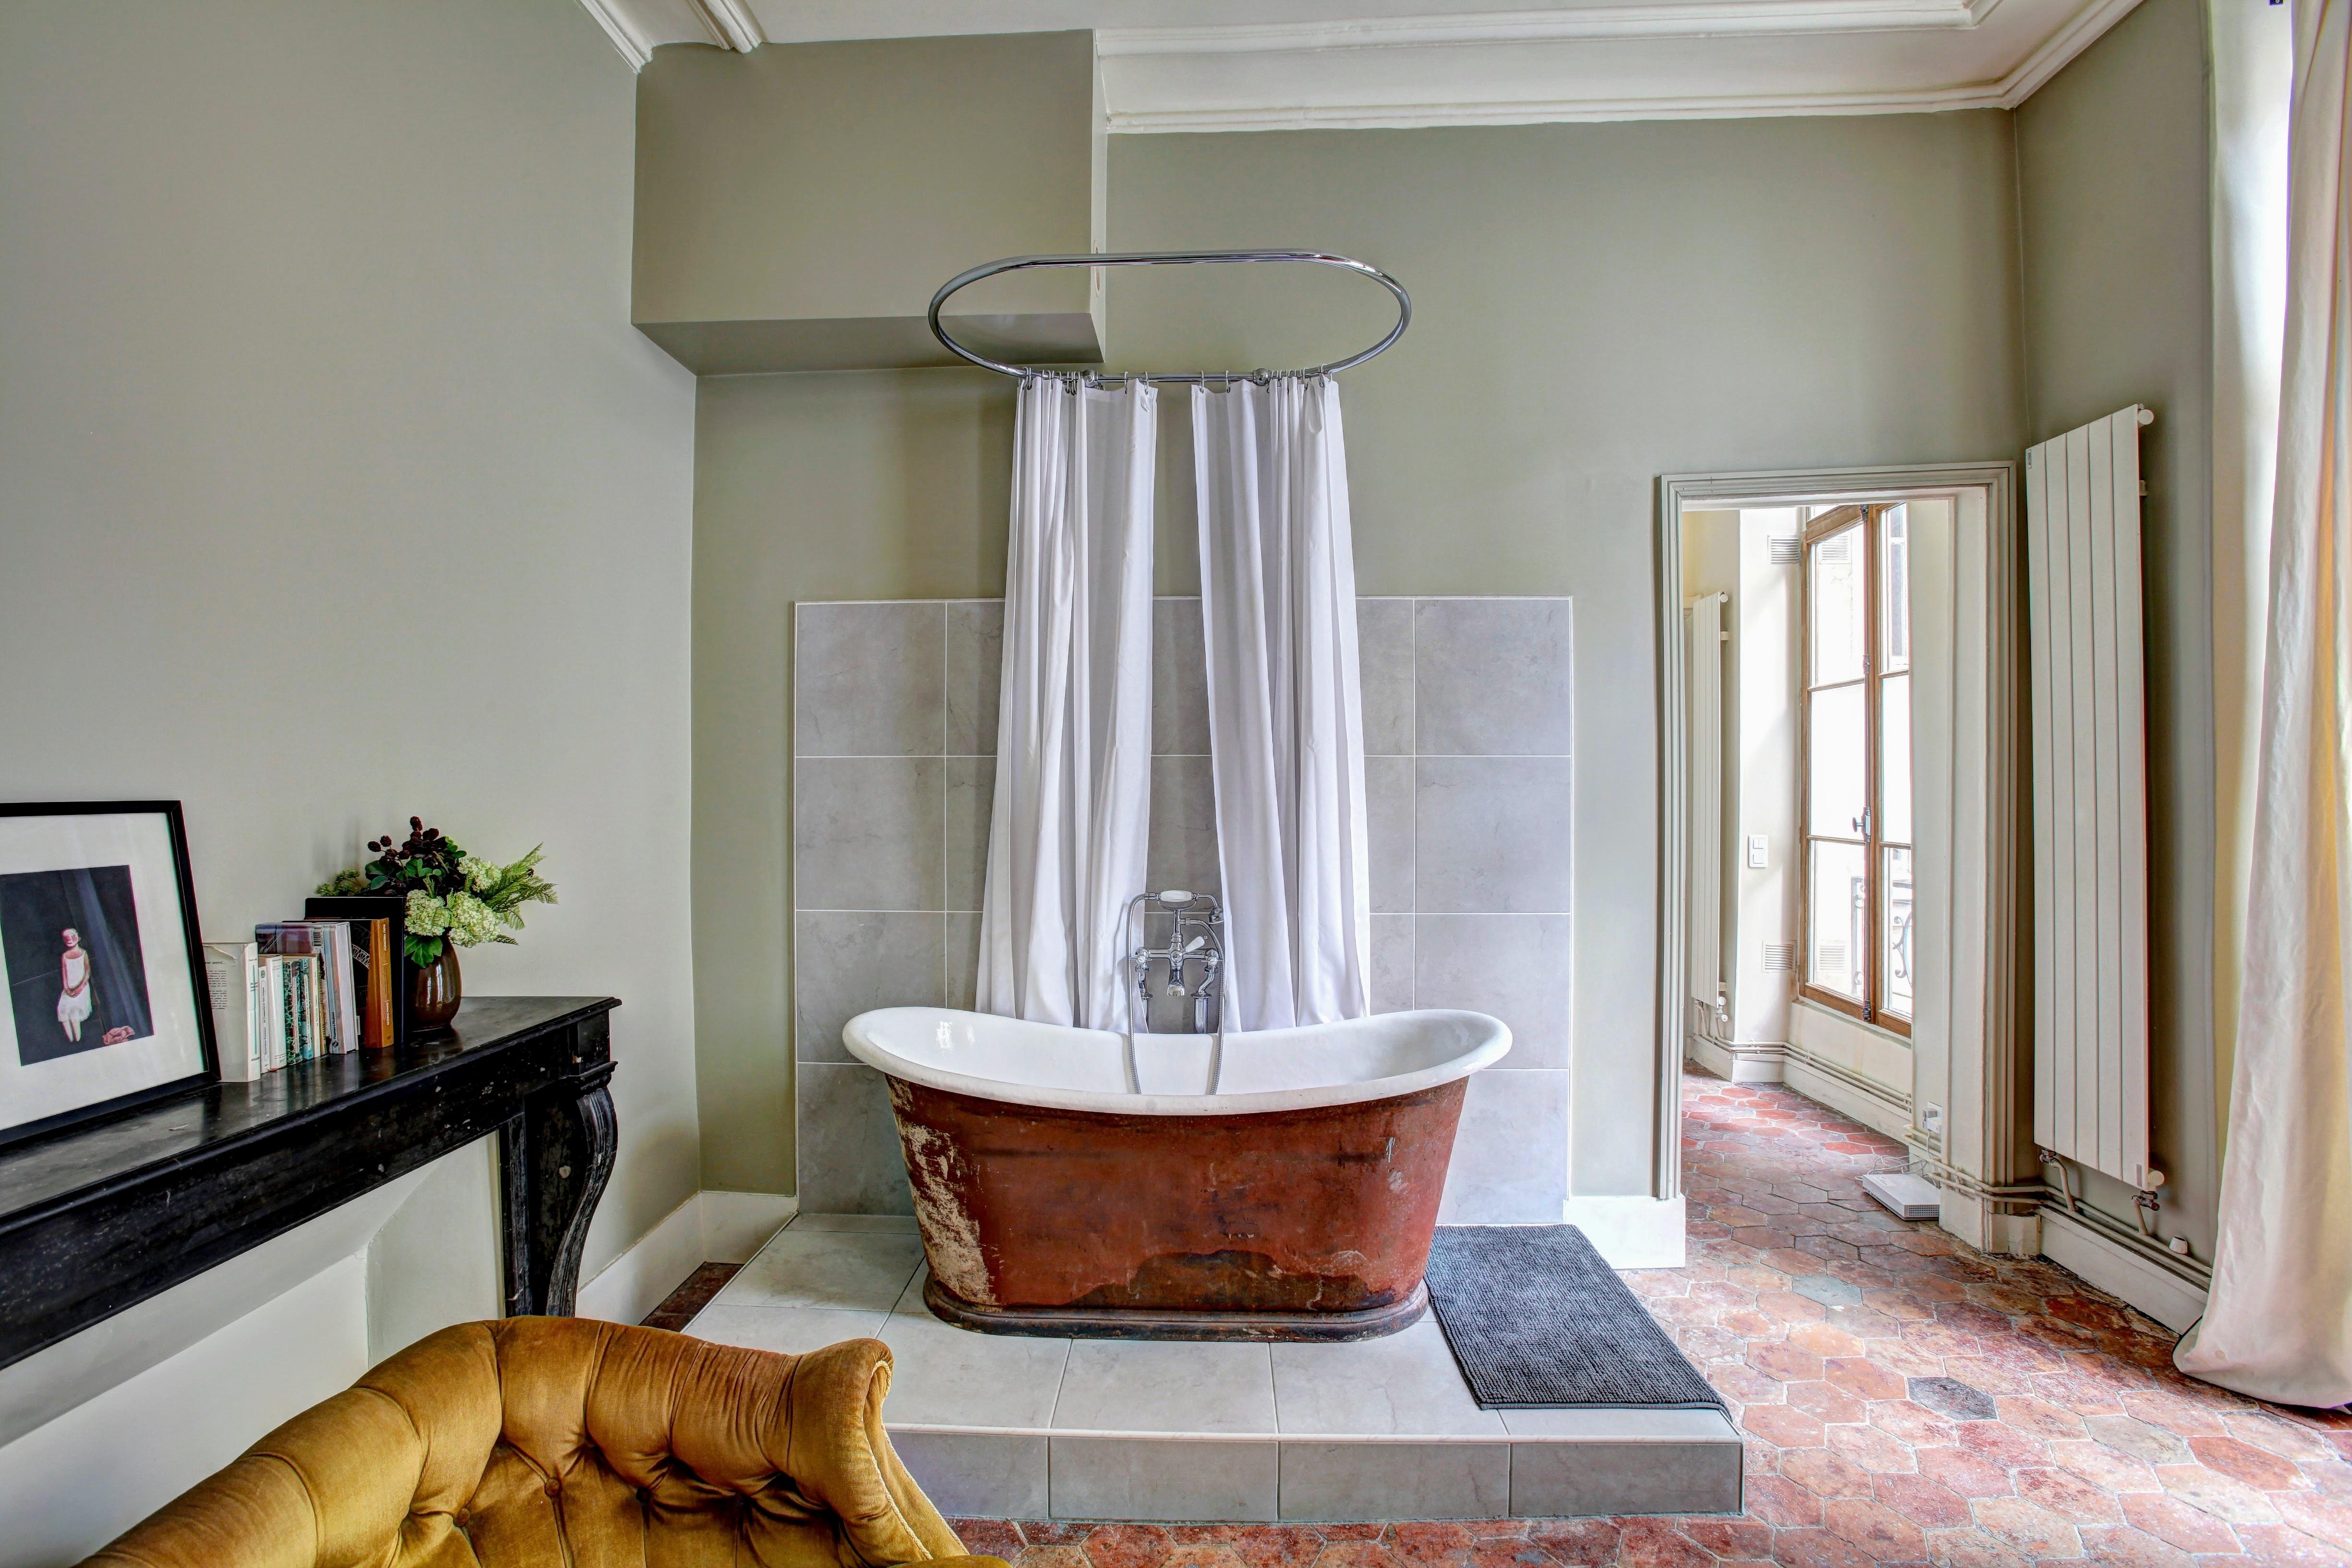 red and white bathtub near yellow fabric sofa